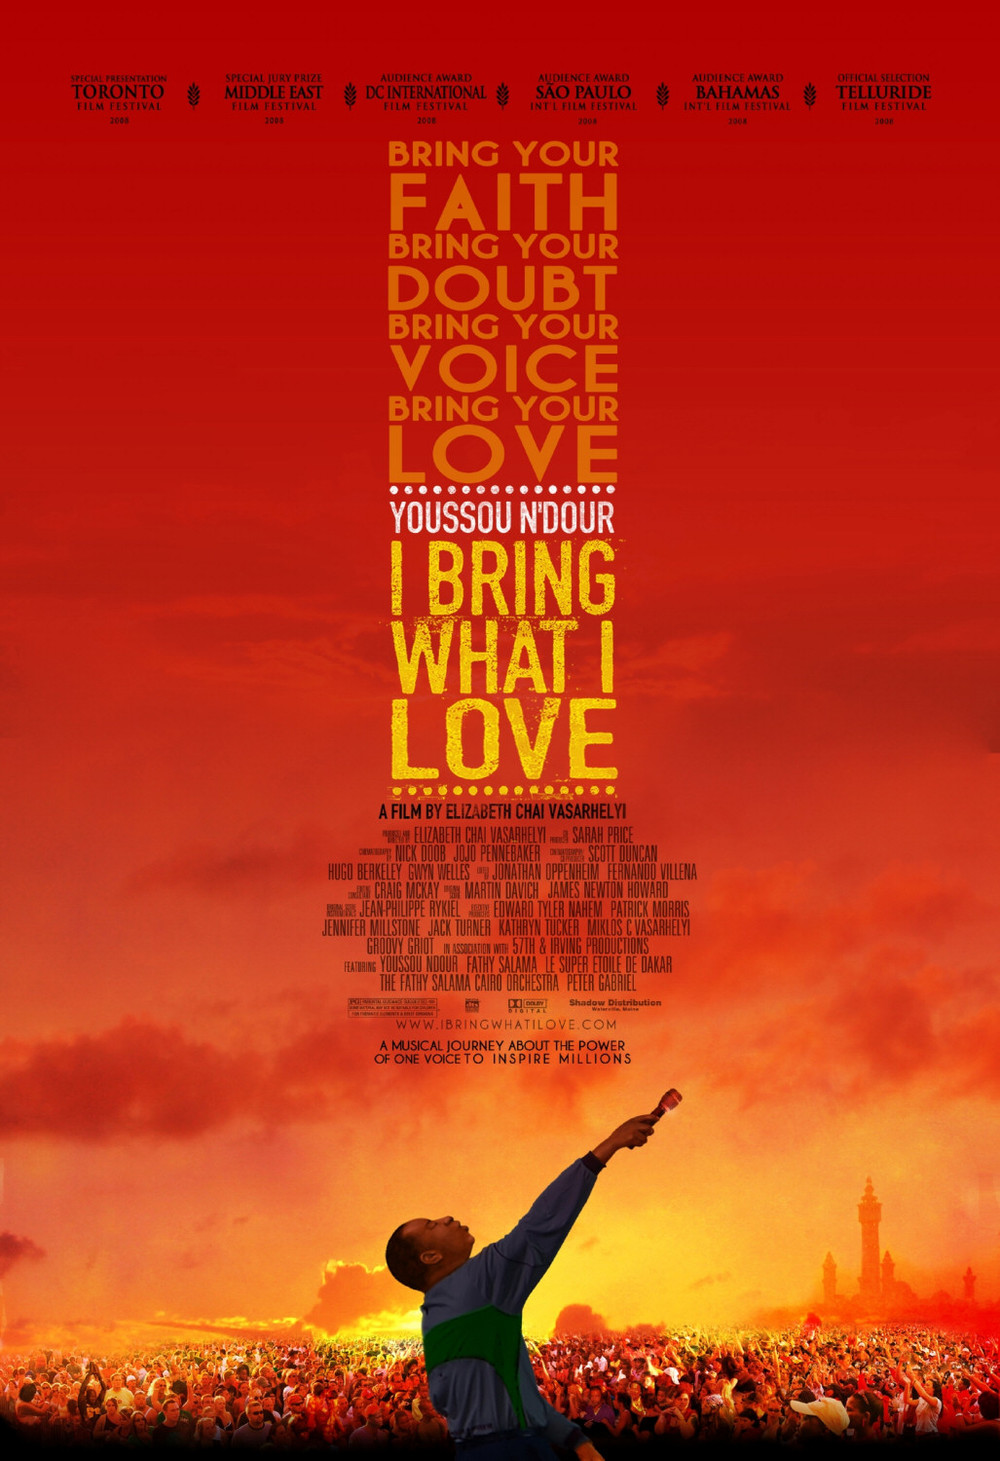 youssou_ndour_i_bring_what_i_love_xlg.jpg